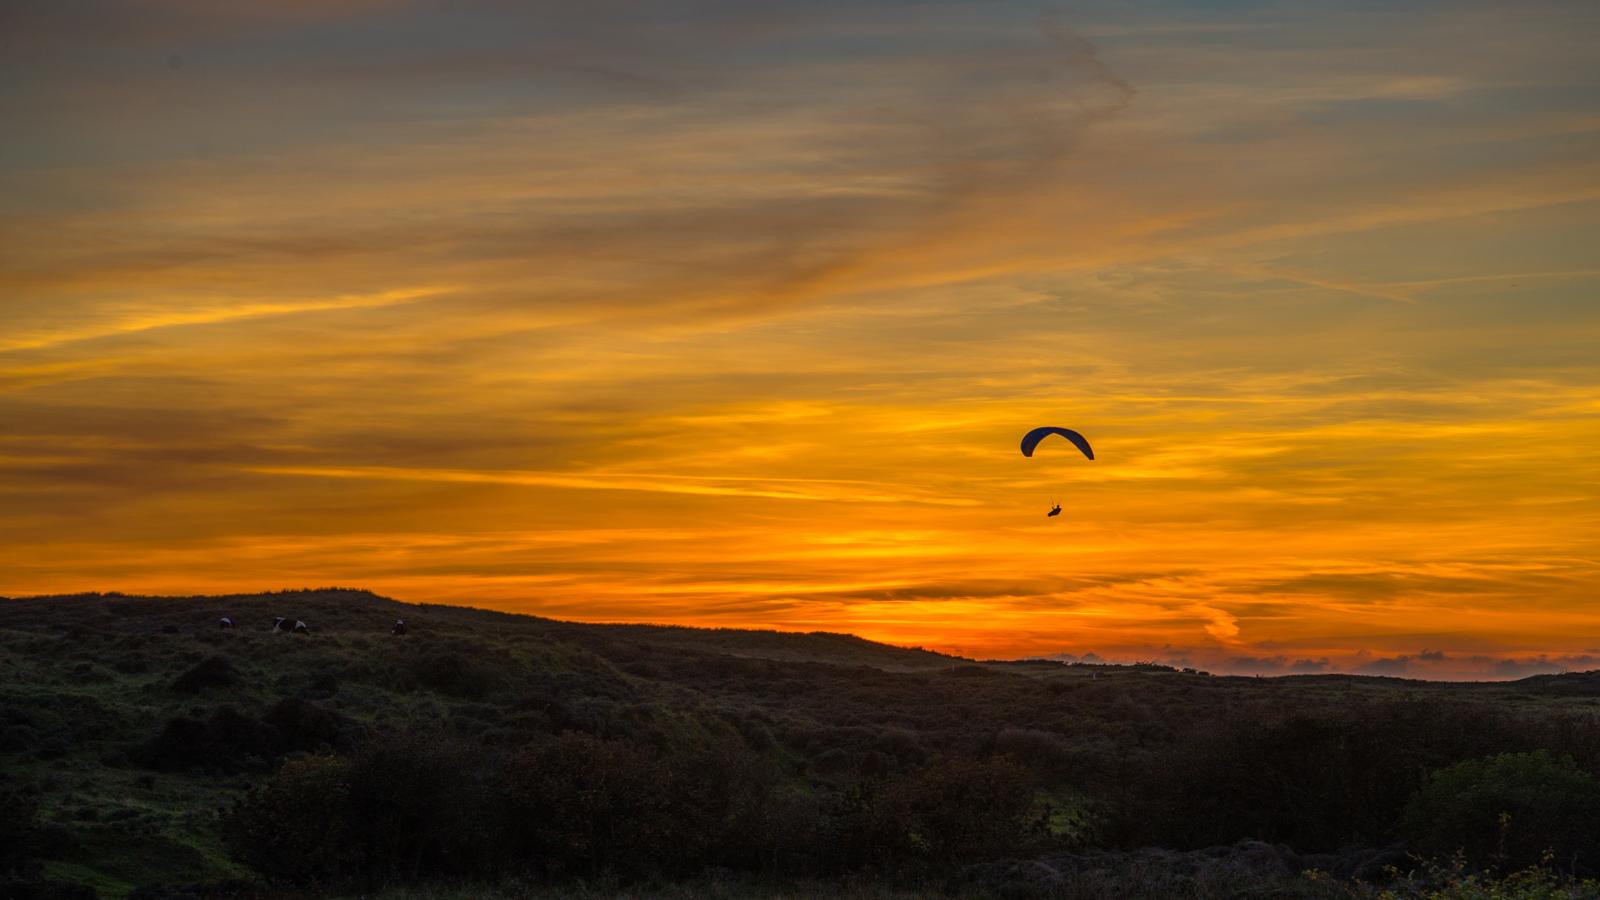 Paraglider i solnedgang